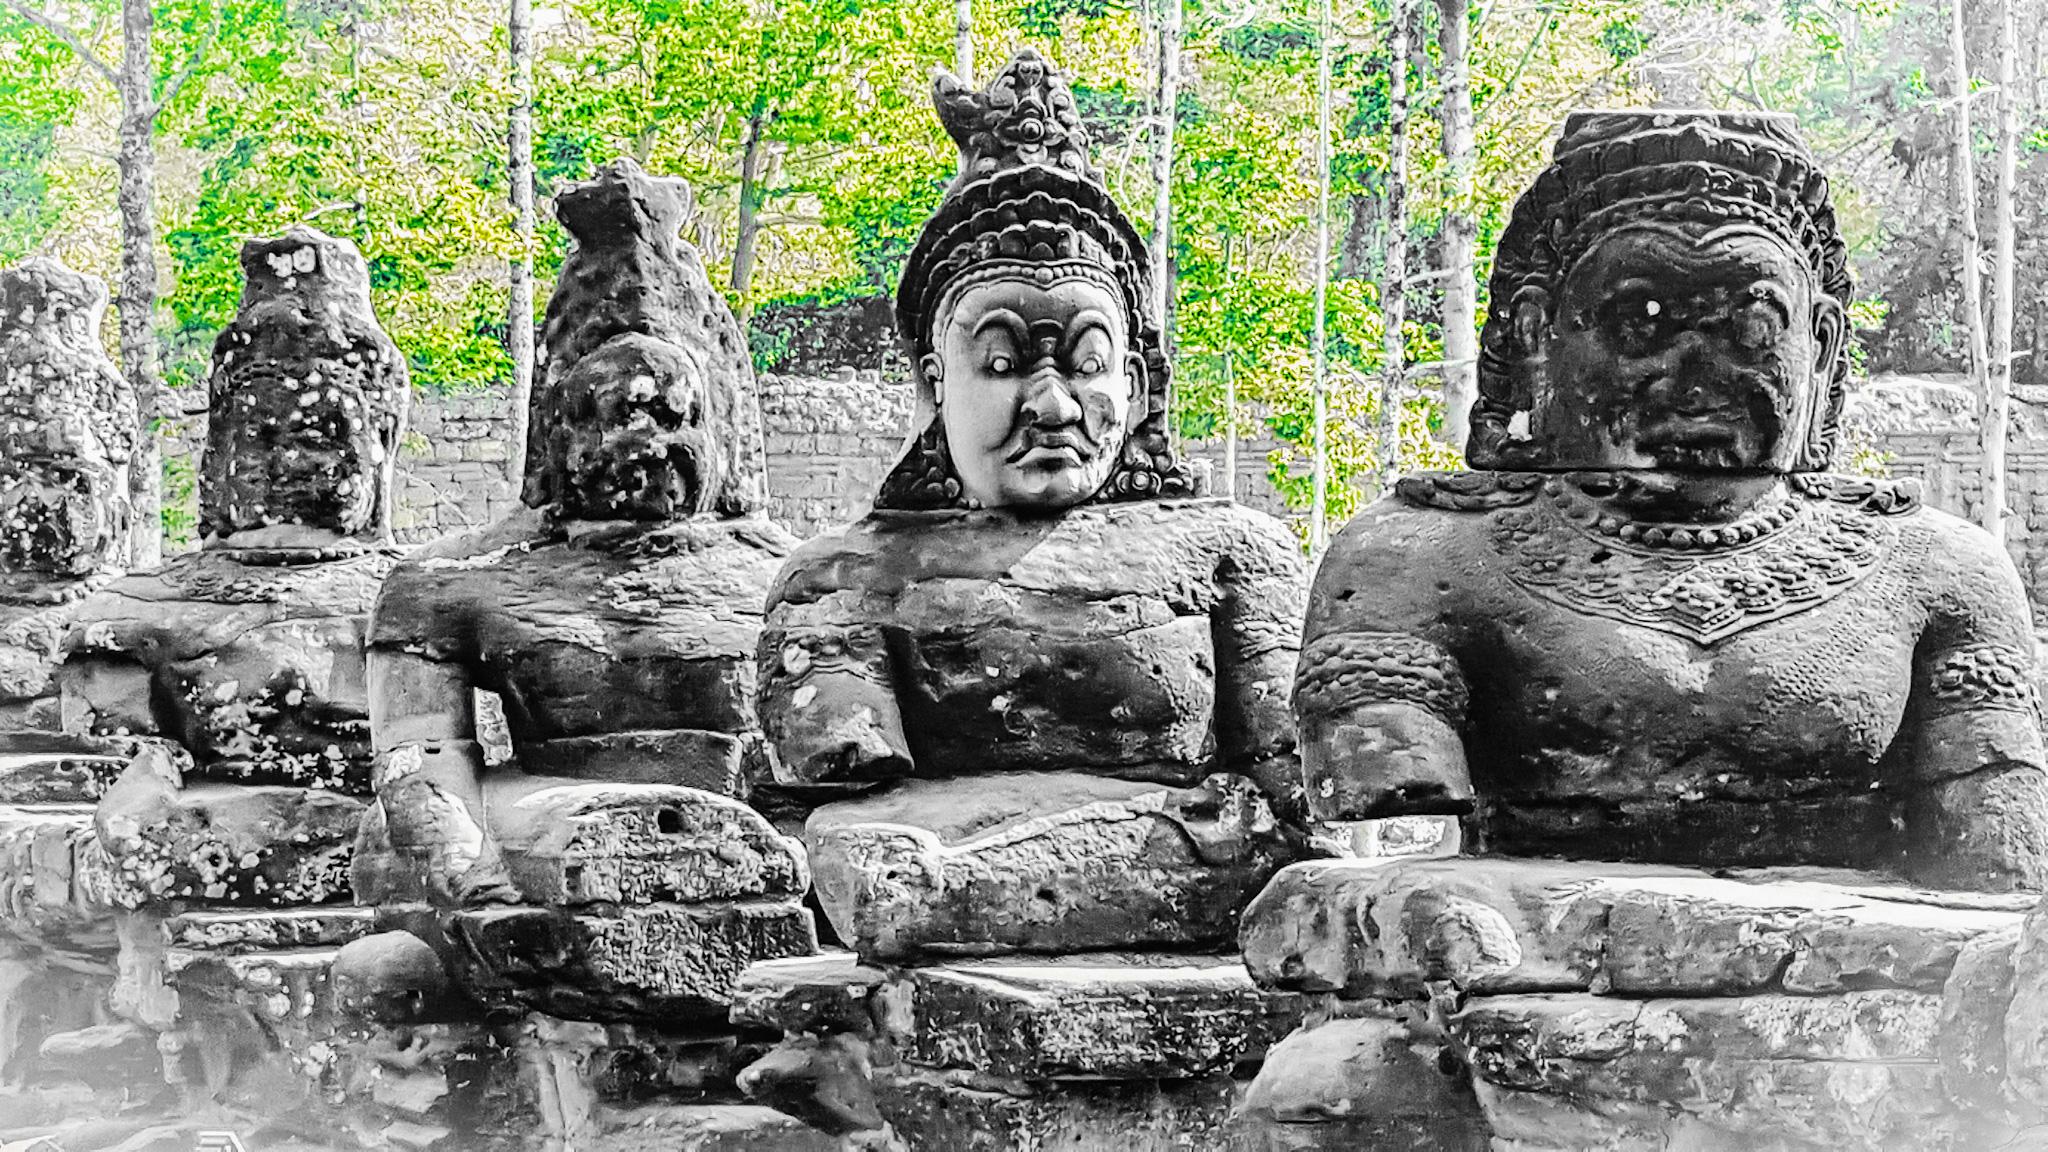 Cambogia statue Siem Reap